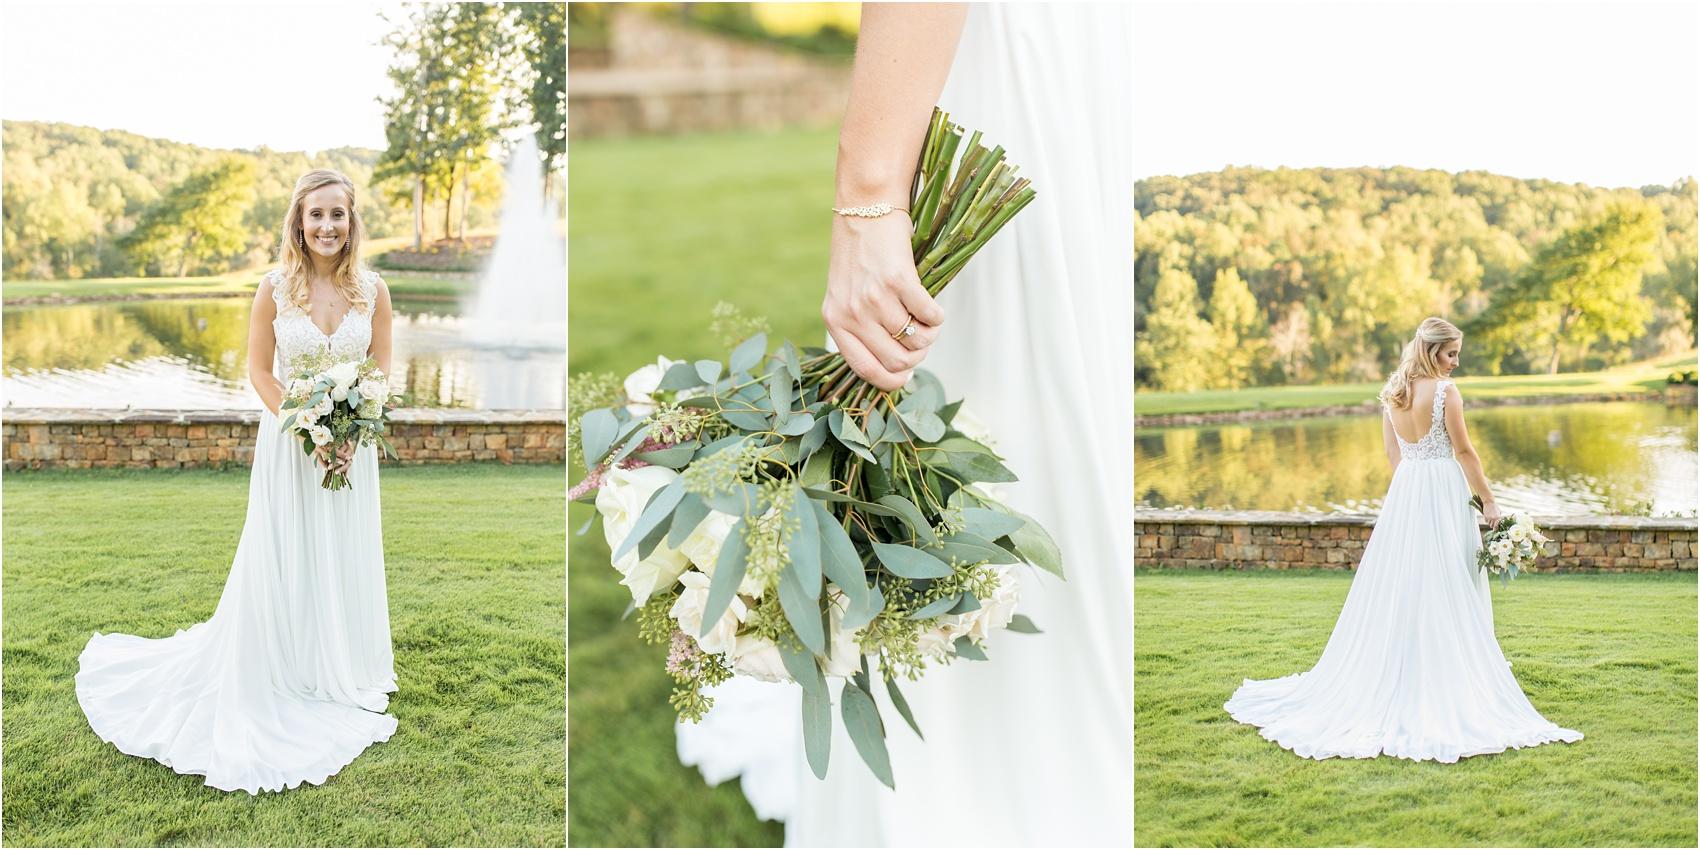 Savannah Eve Photography- Jurek-Woodworth Wedding- Sneak Peek-69.jpg